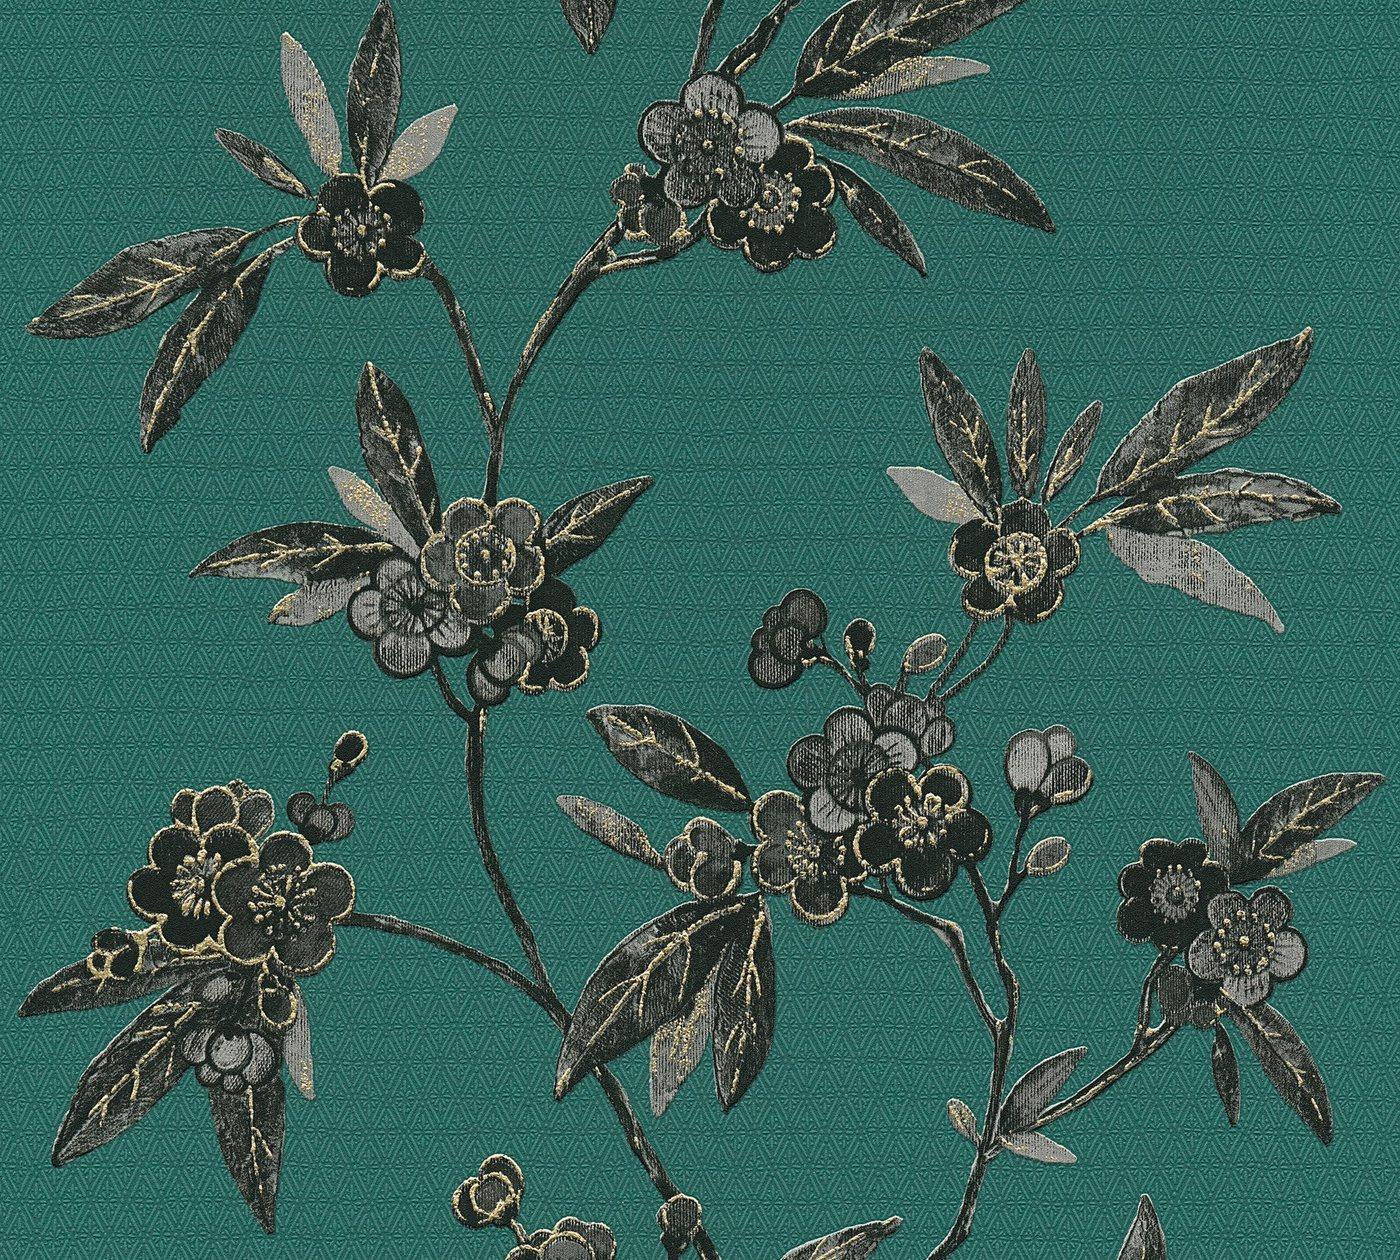 Vliestapete »Asian Fusion«, aufgeschäumt, floral, asiatisch, grün